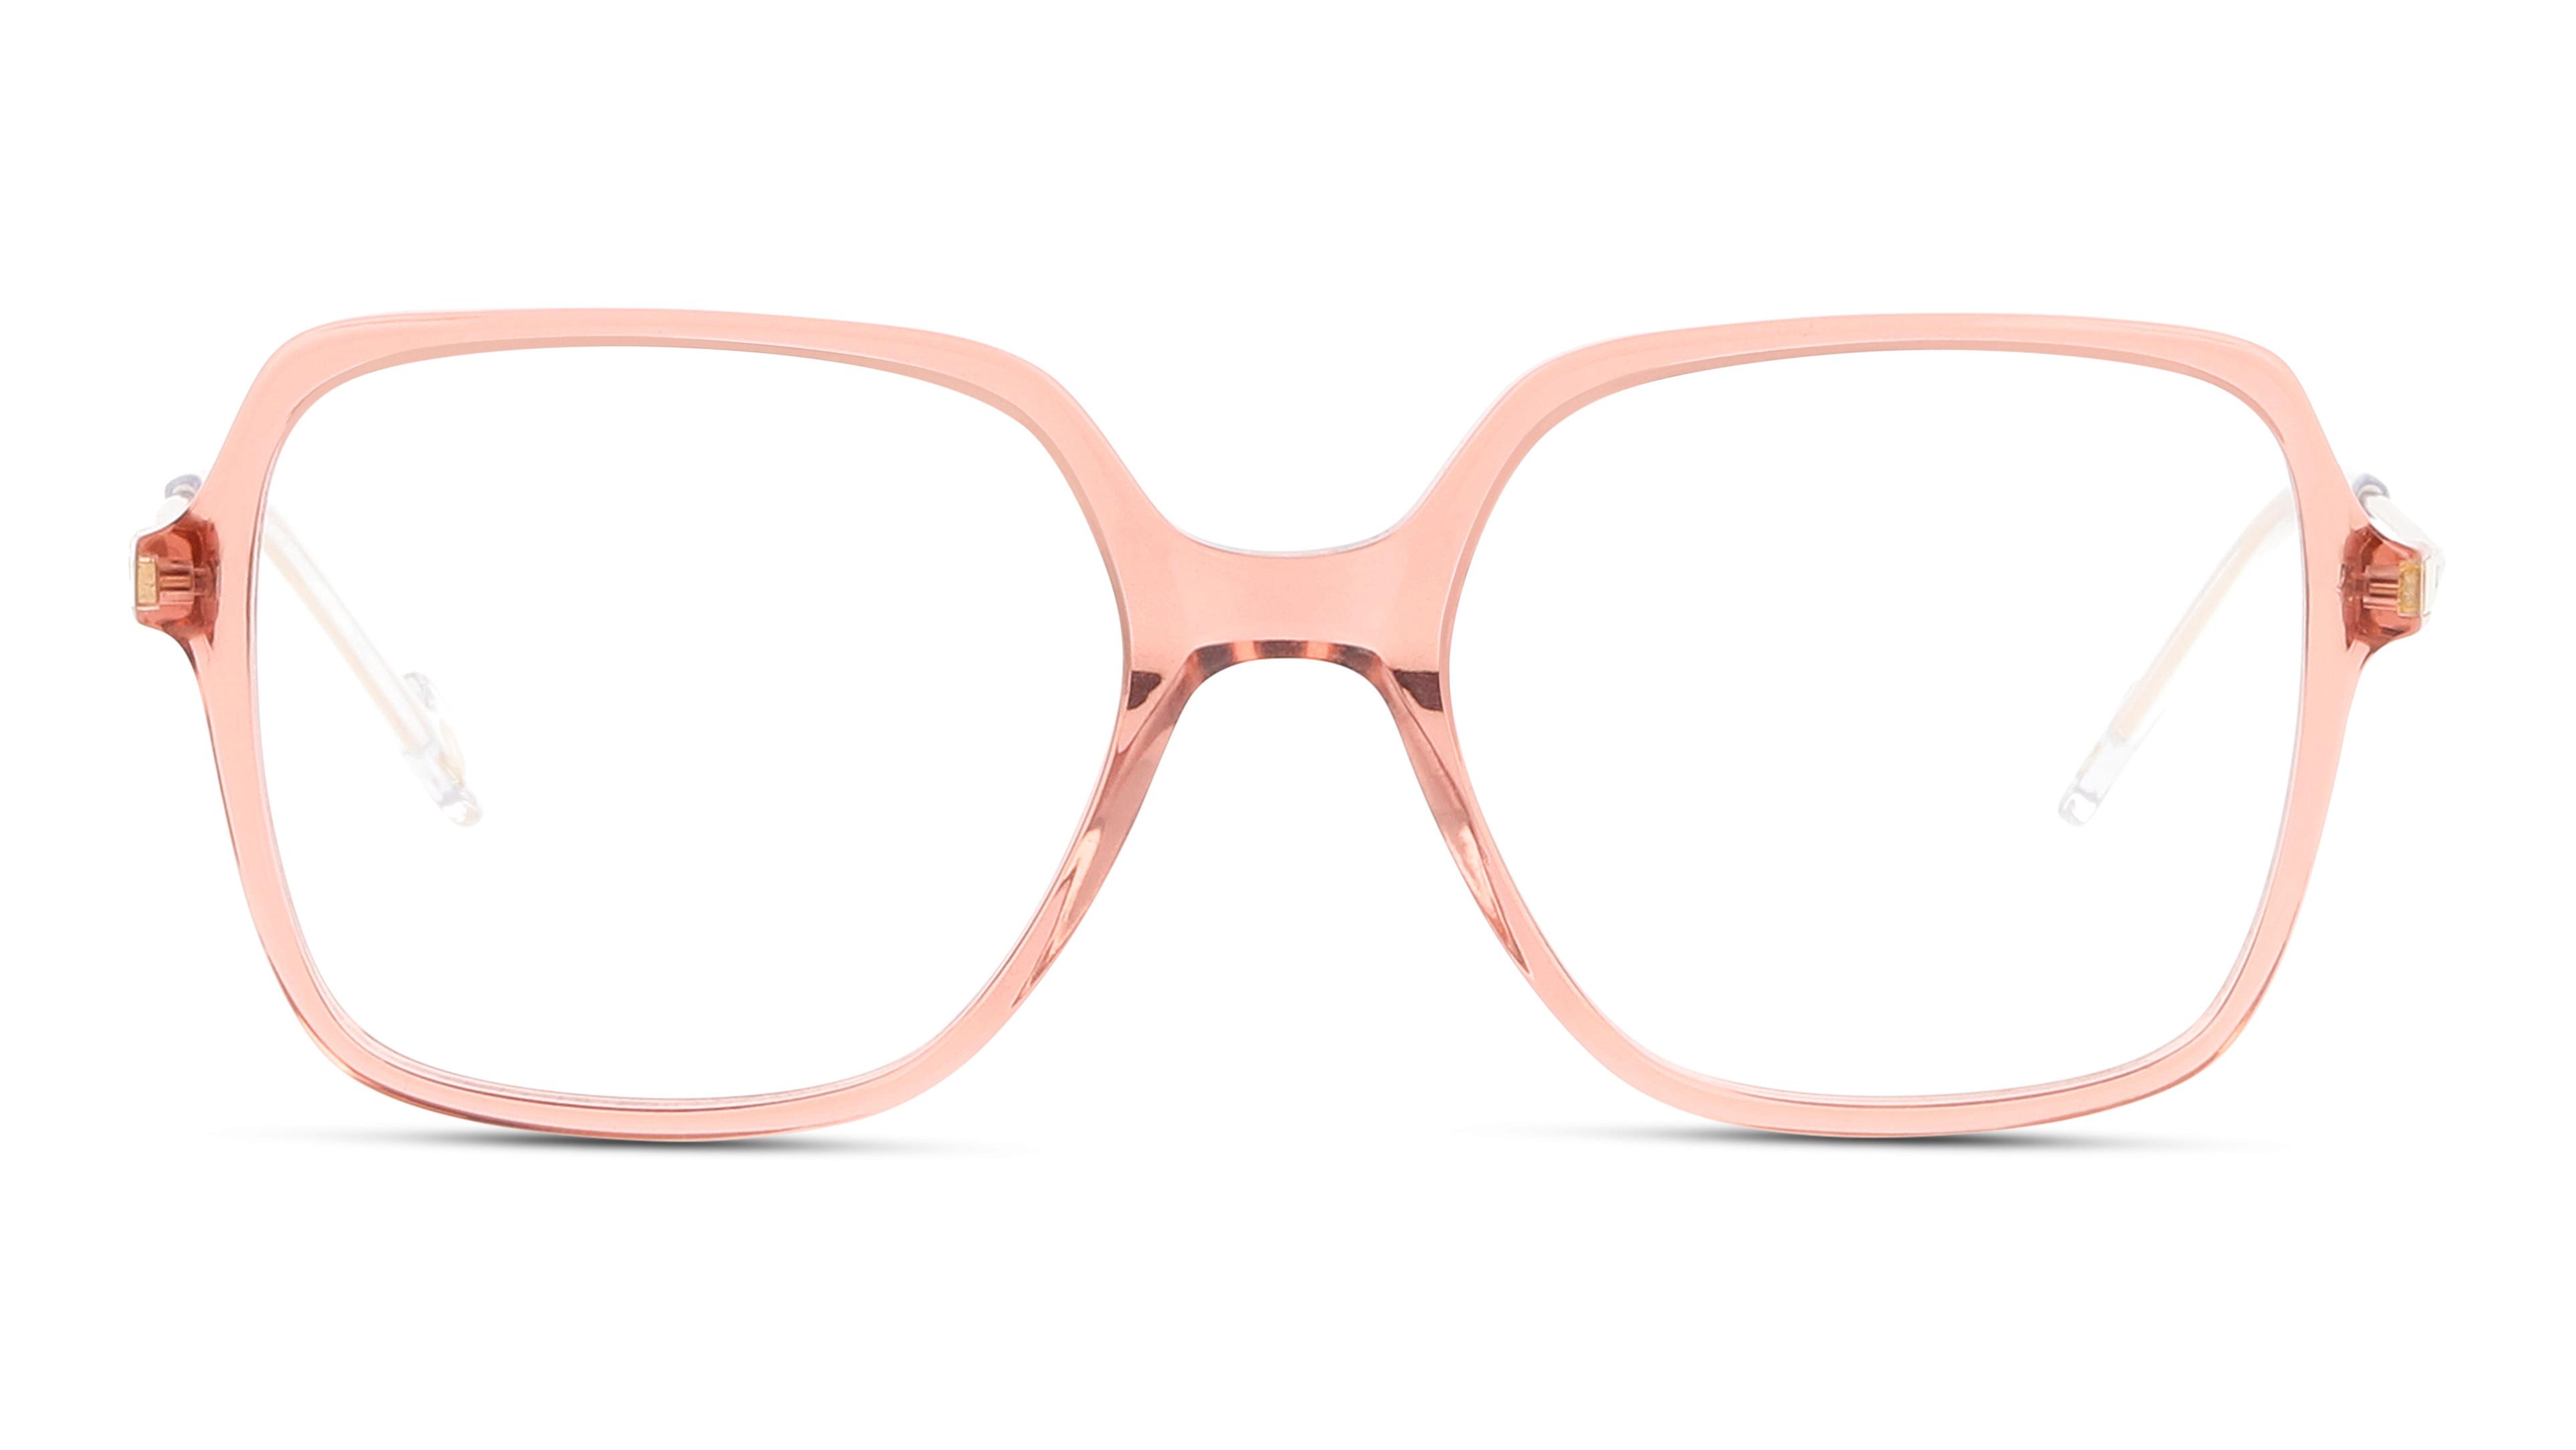 8719154585050-front-01-in-style-iskt11-eyewear-pink-gold